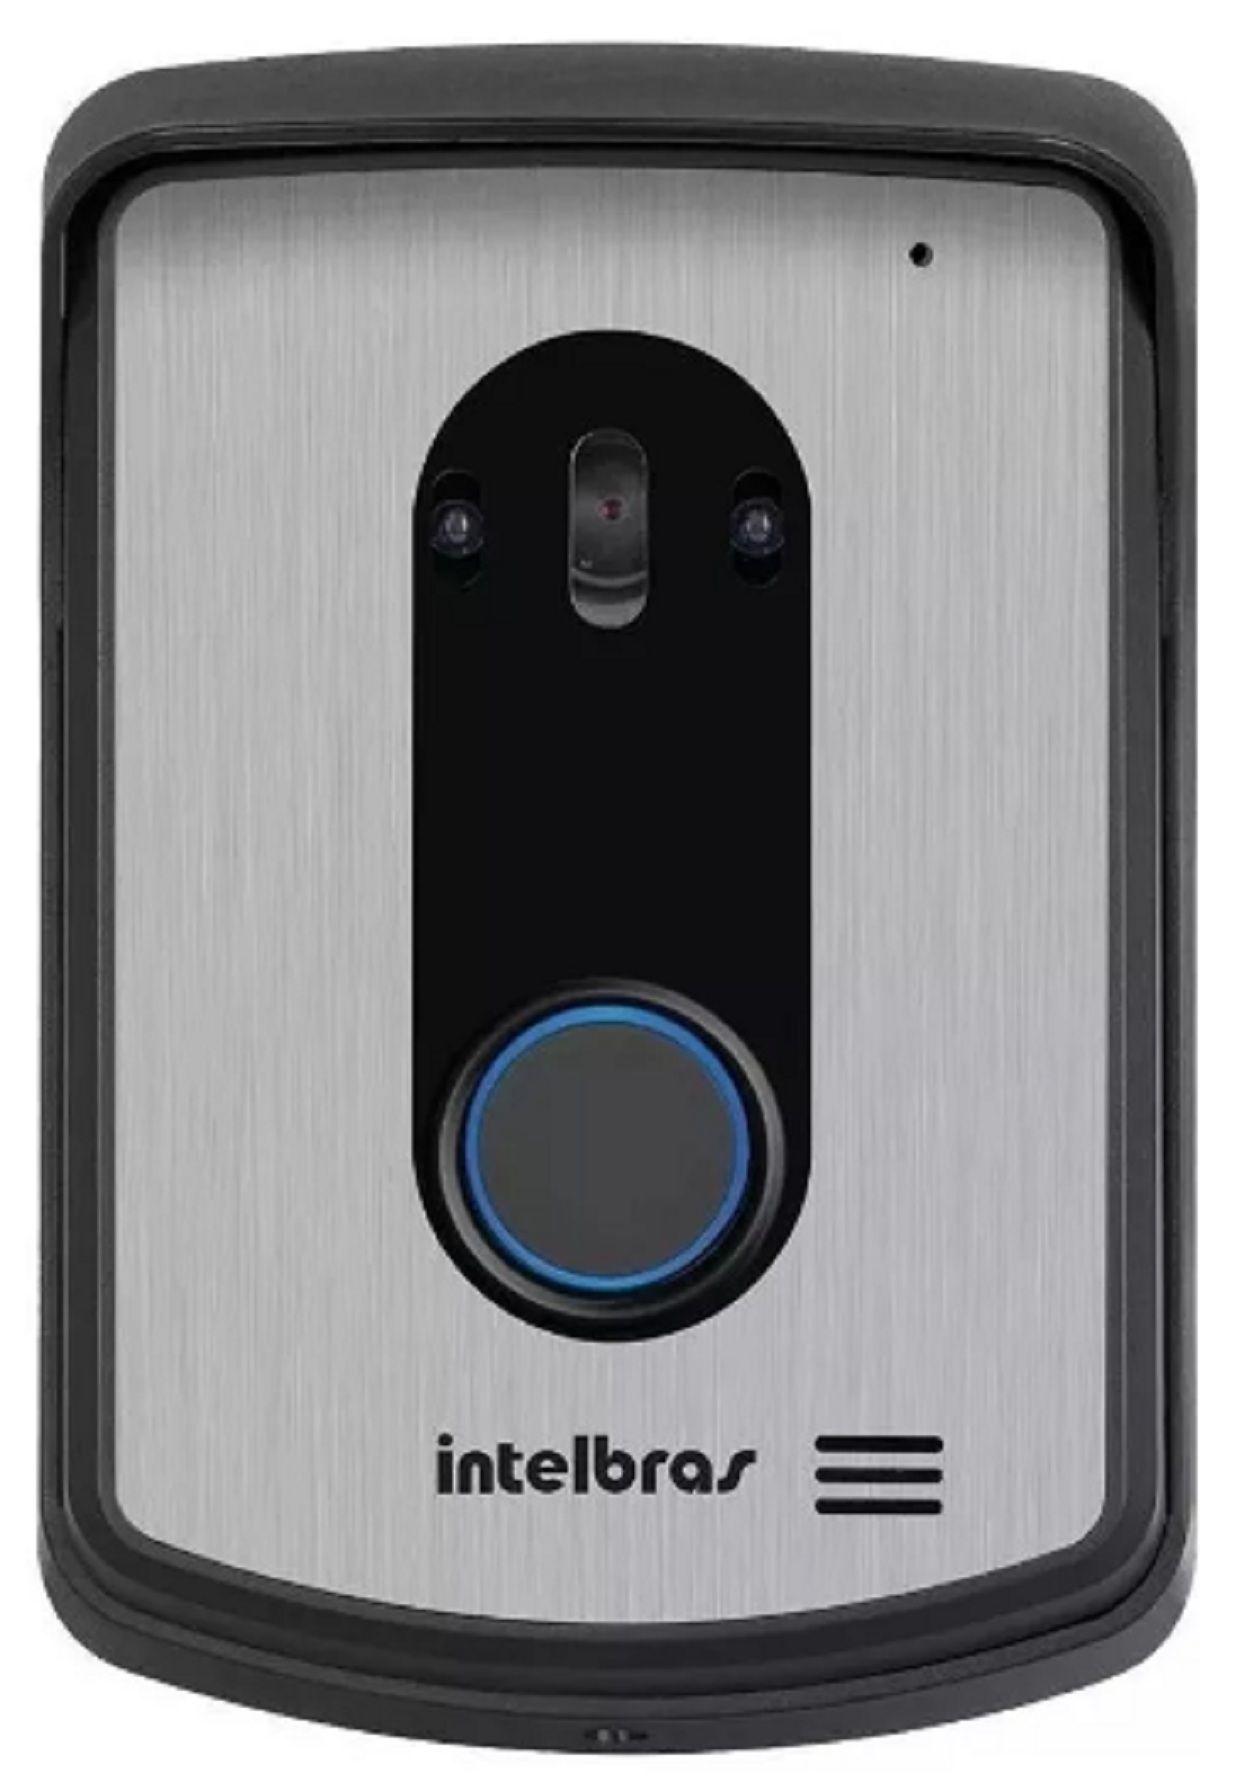 Kit Completo Vídeo Porteiro Intelbras Iv7010 03 Cameras